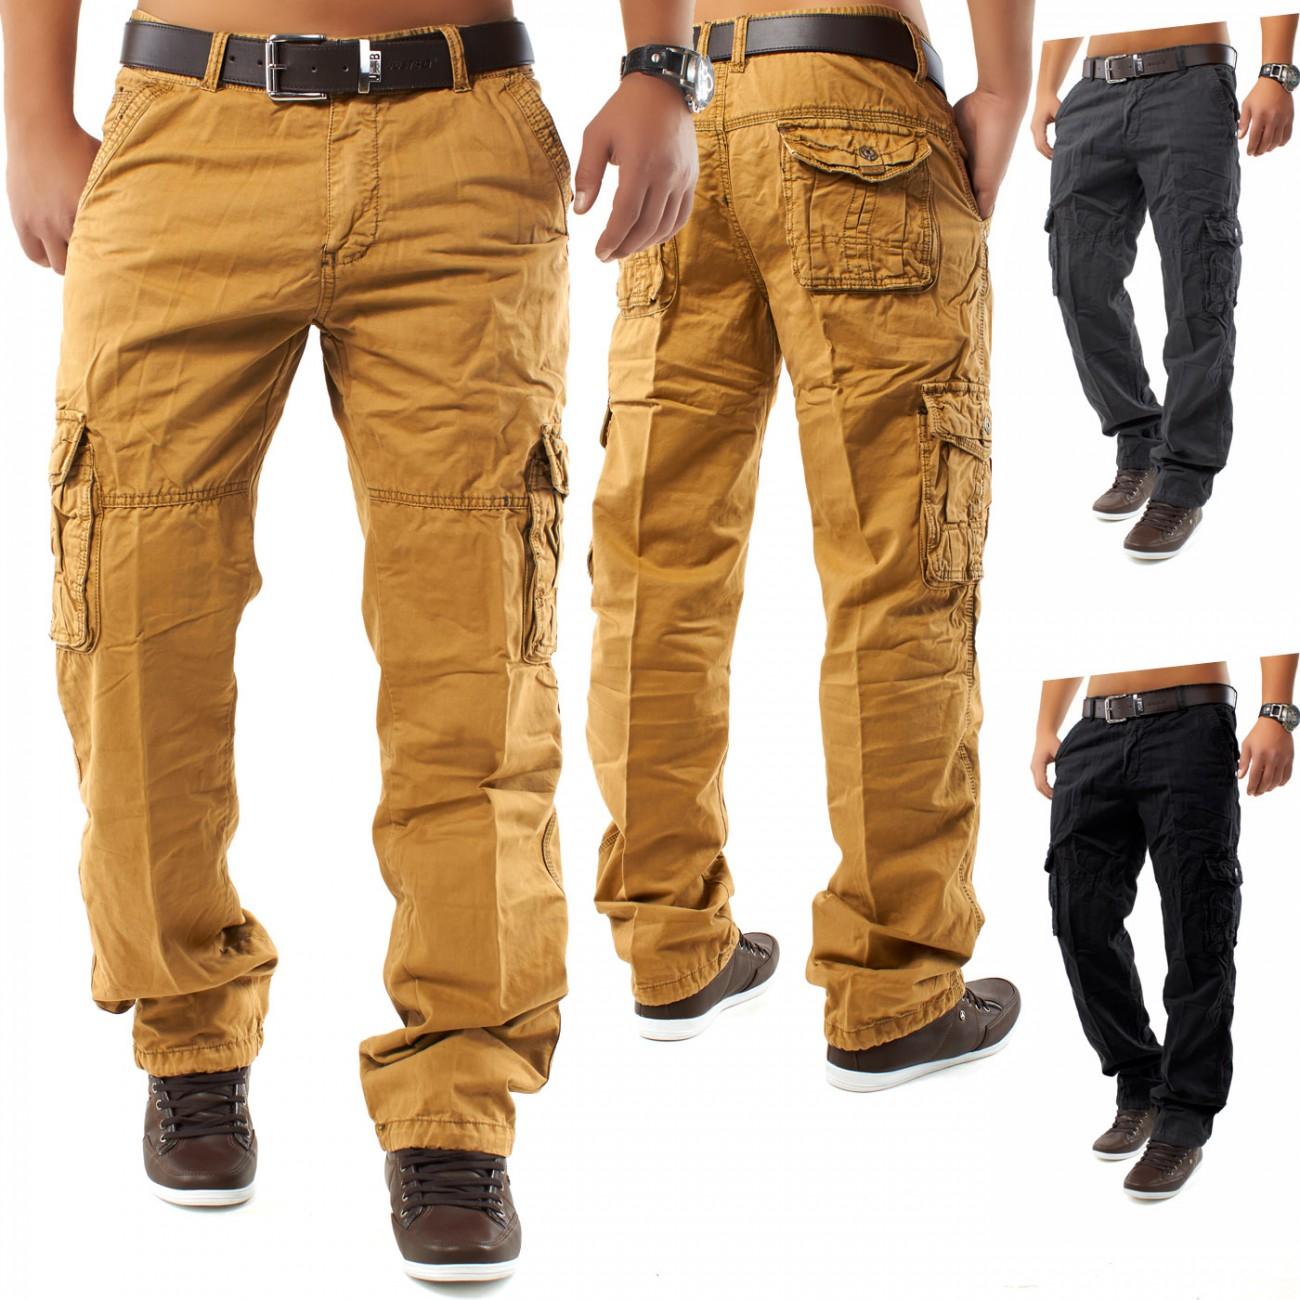 cargo hose jeans loose fit chinohose cargohose work trousers dromedar ebay. Black Bedroom Furniture Sets. Home Design Ideas